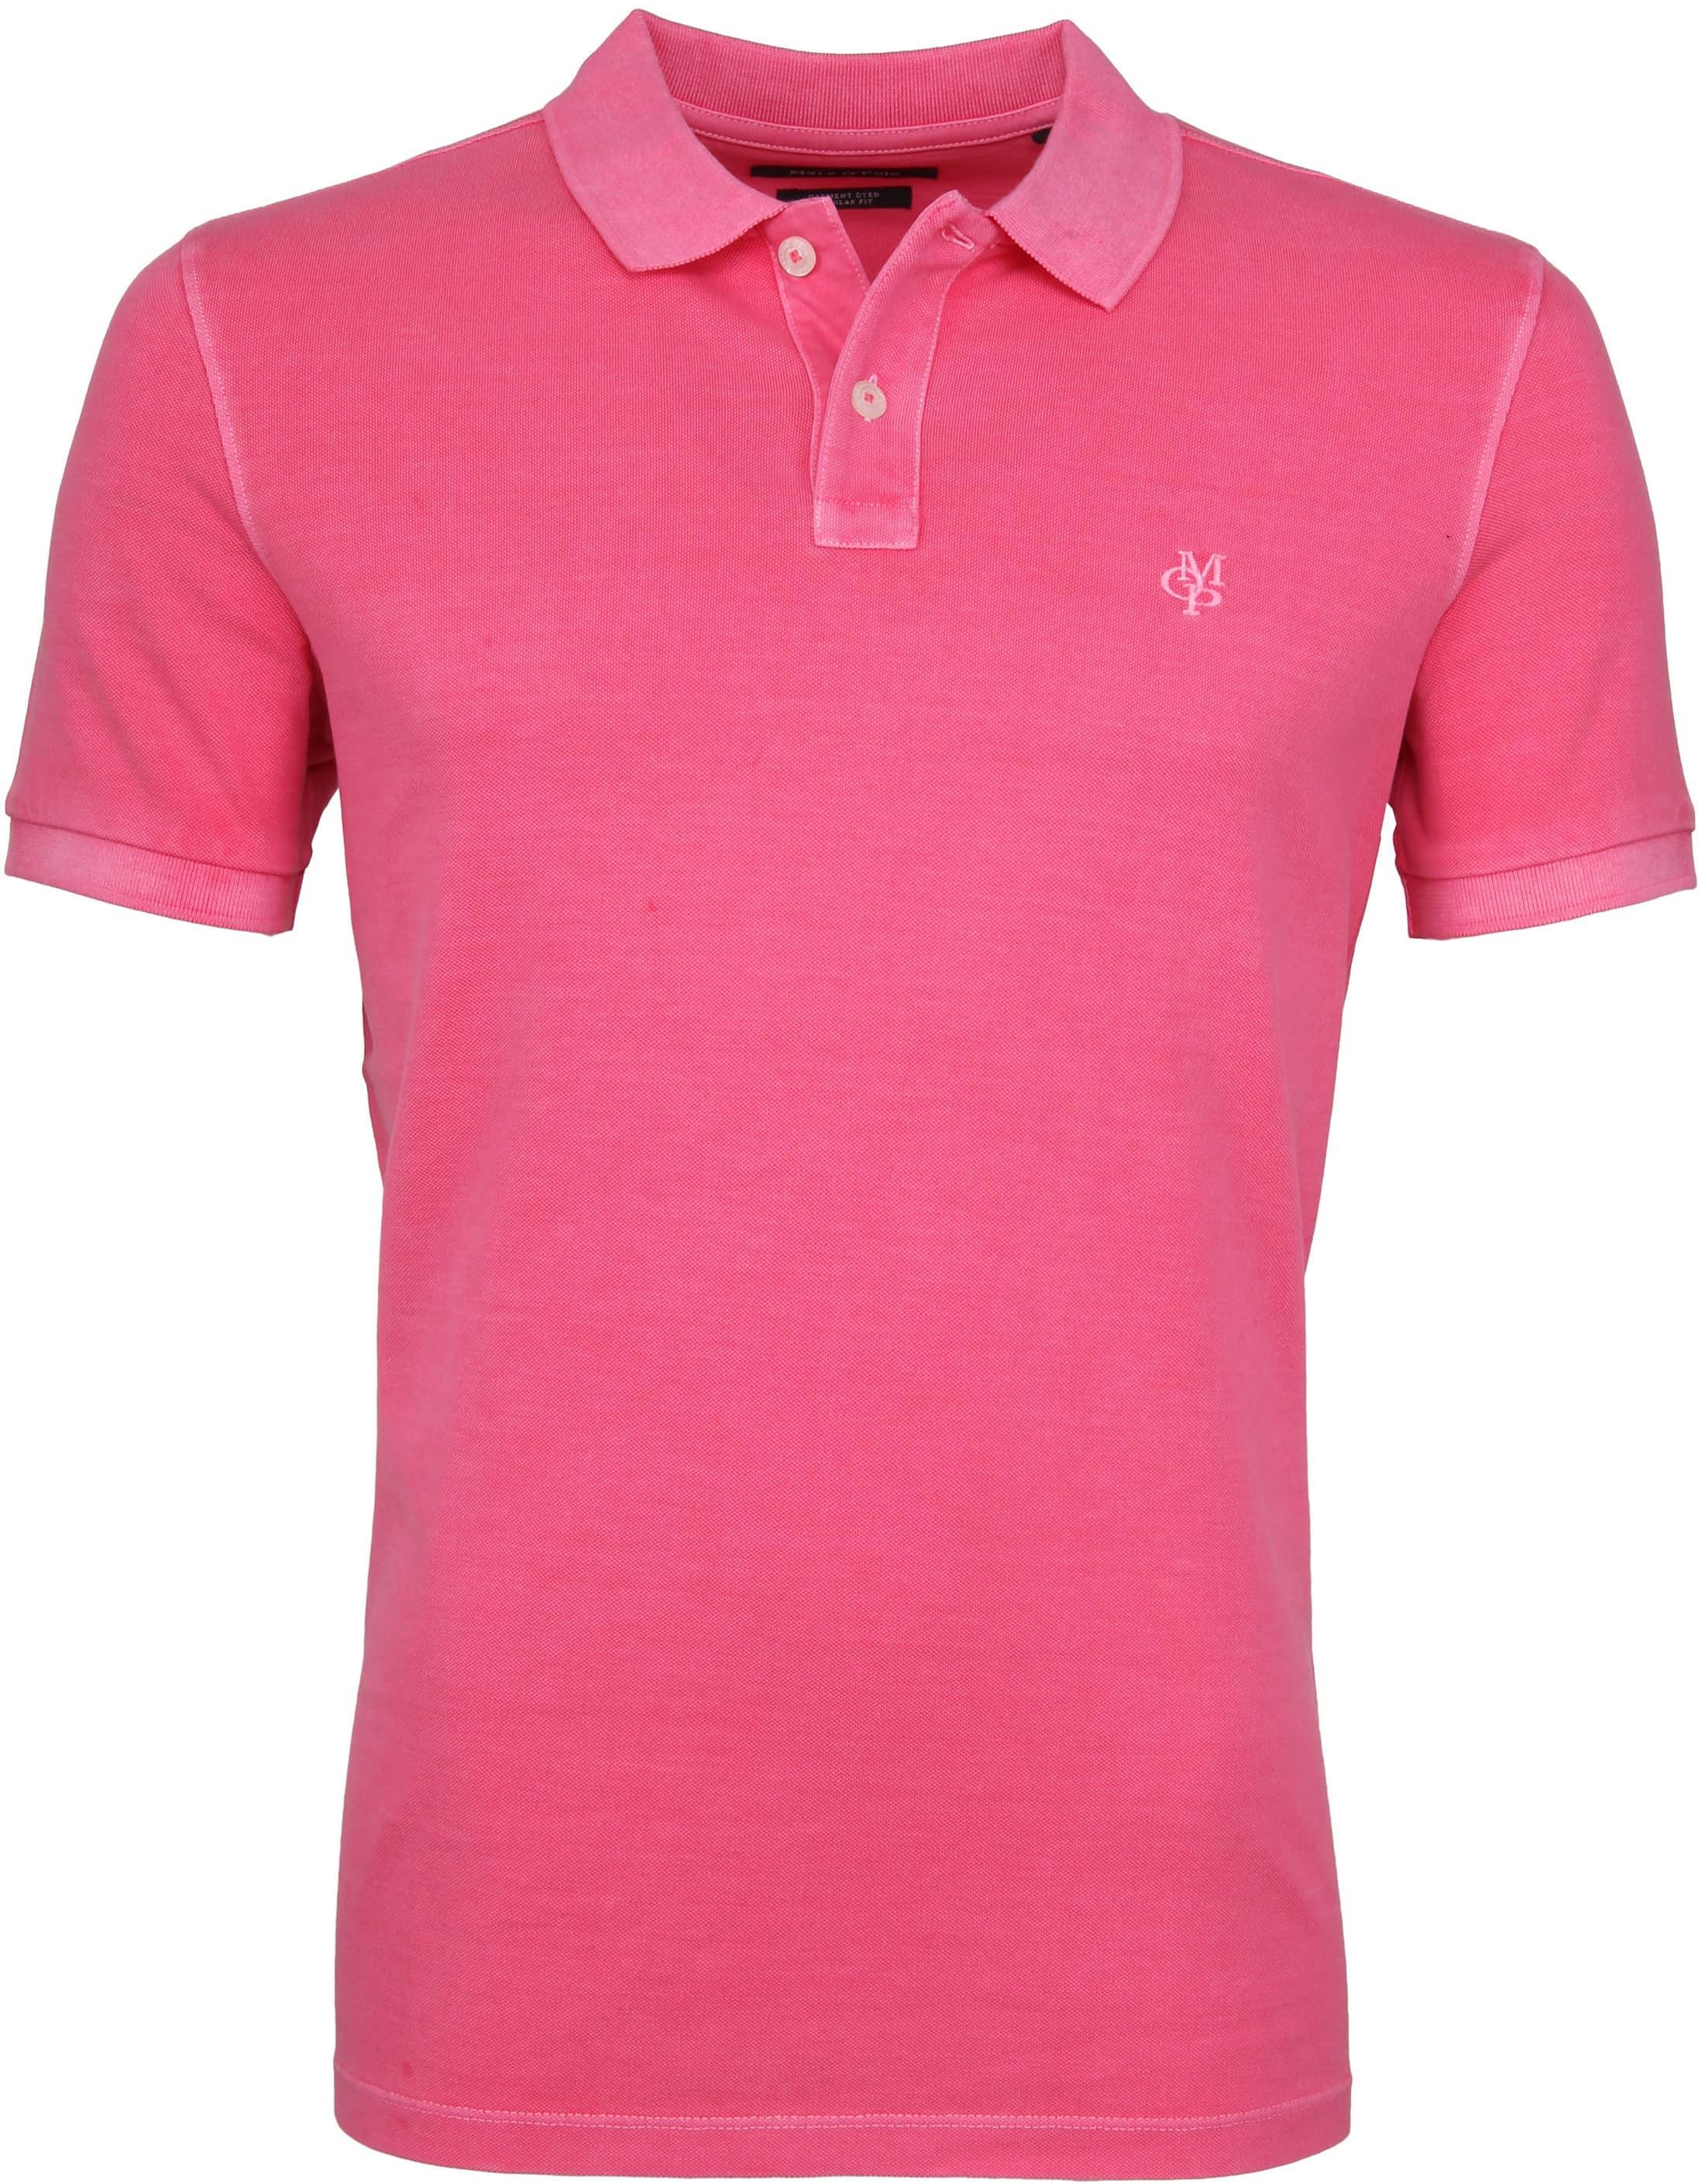 Marc O'Polo Poloshirt Garment Dyed Ibis Pink foto 0